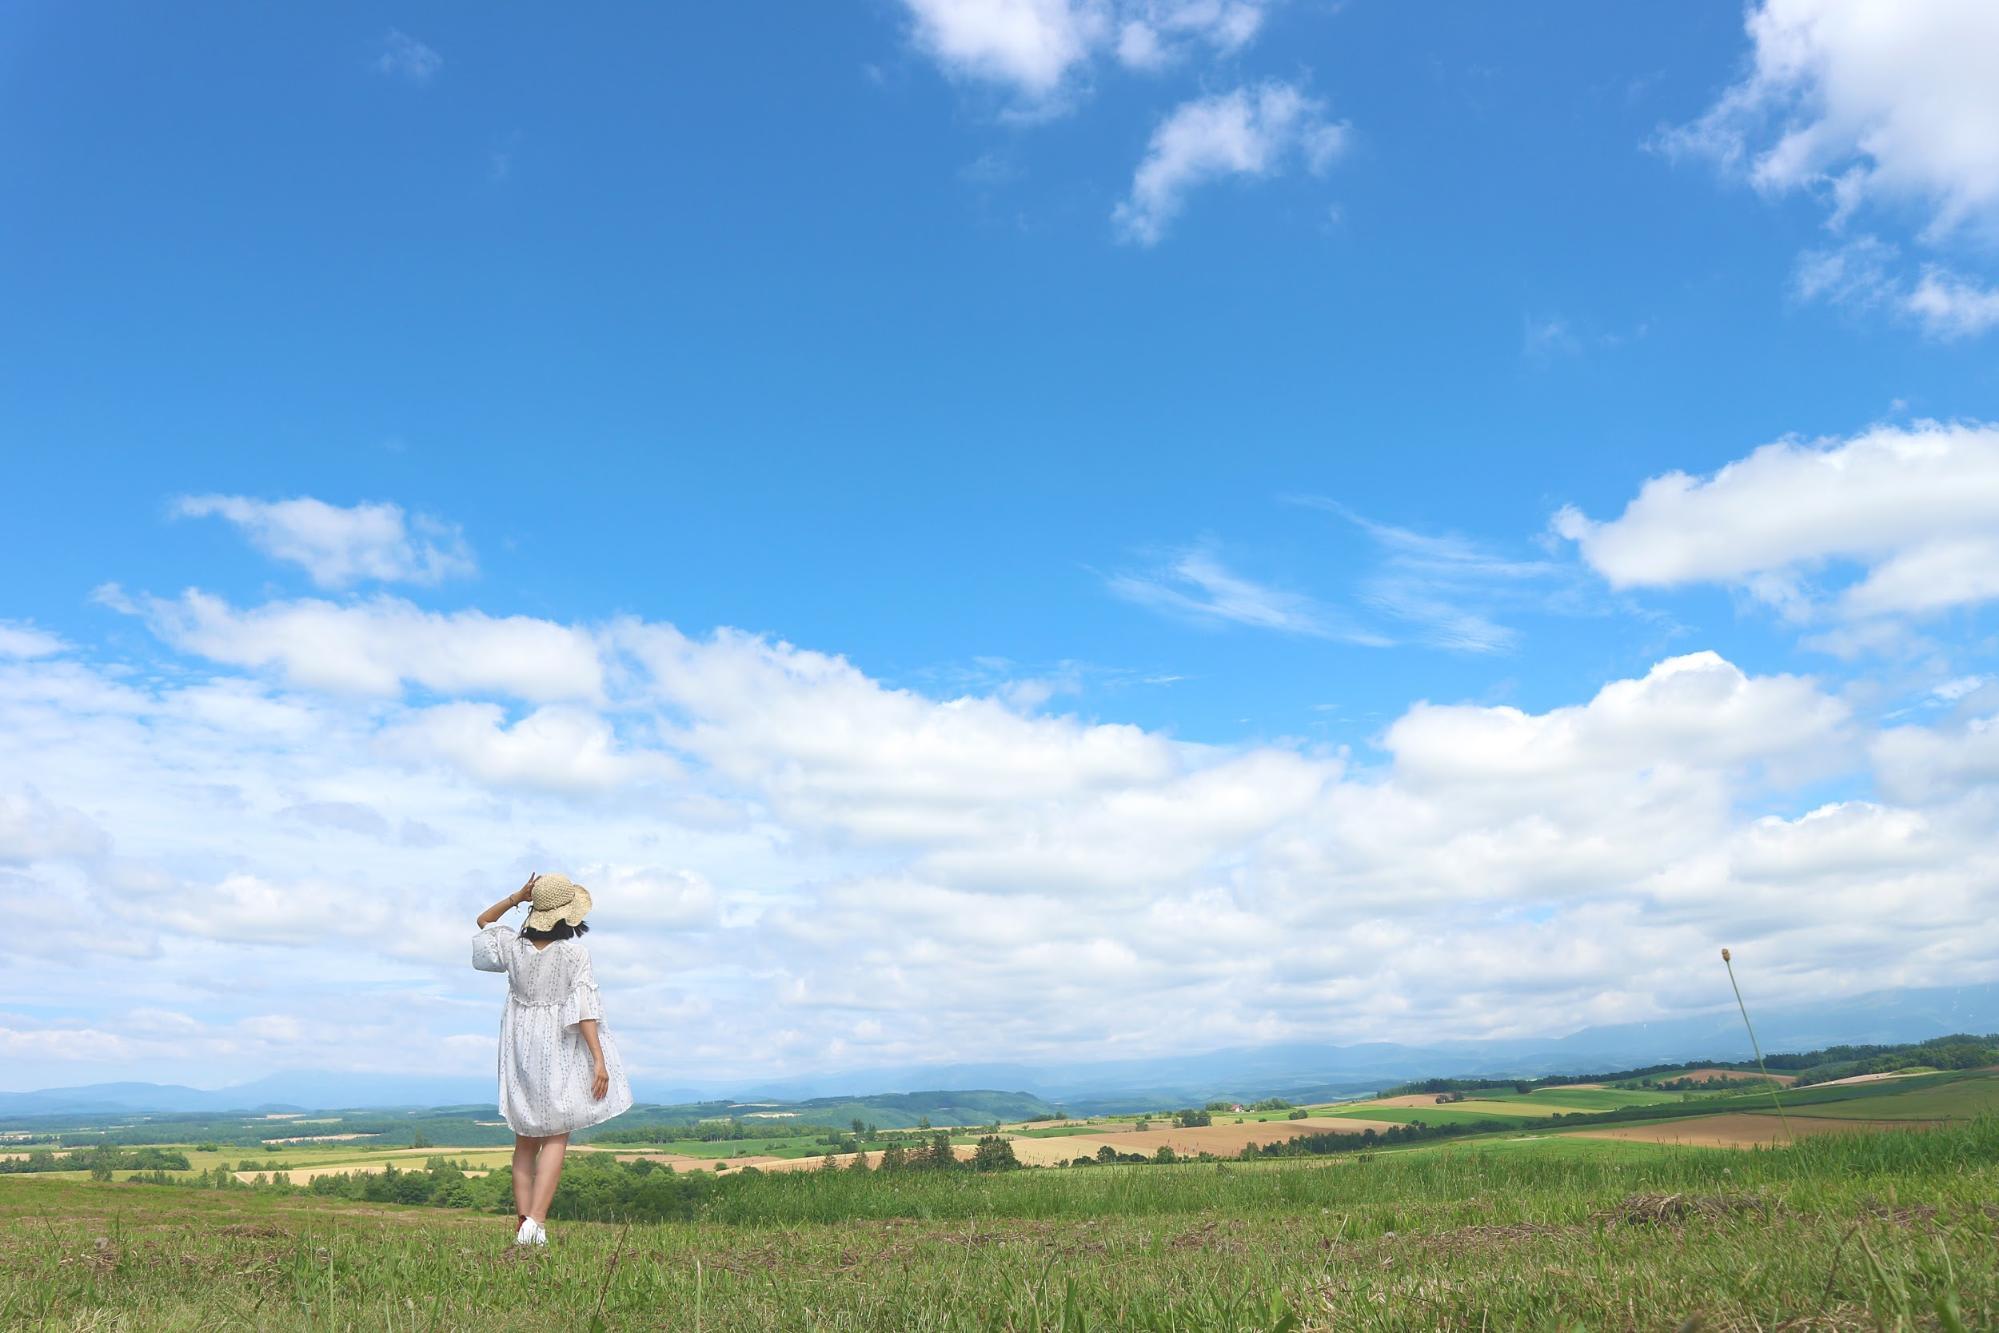 đồng cỏ tại hokkaido